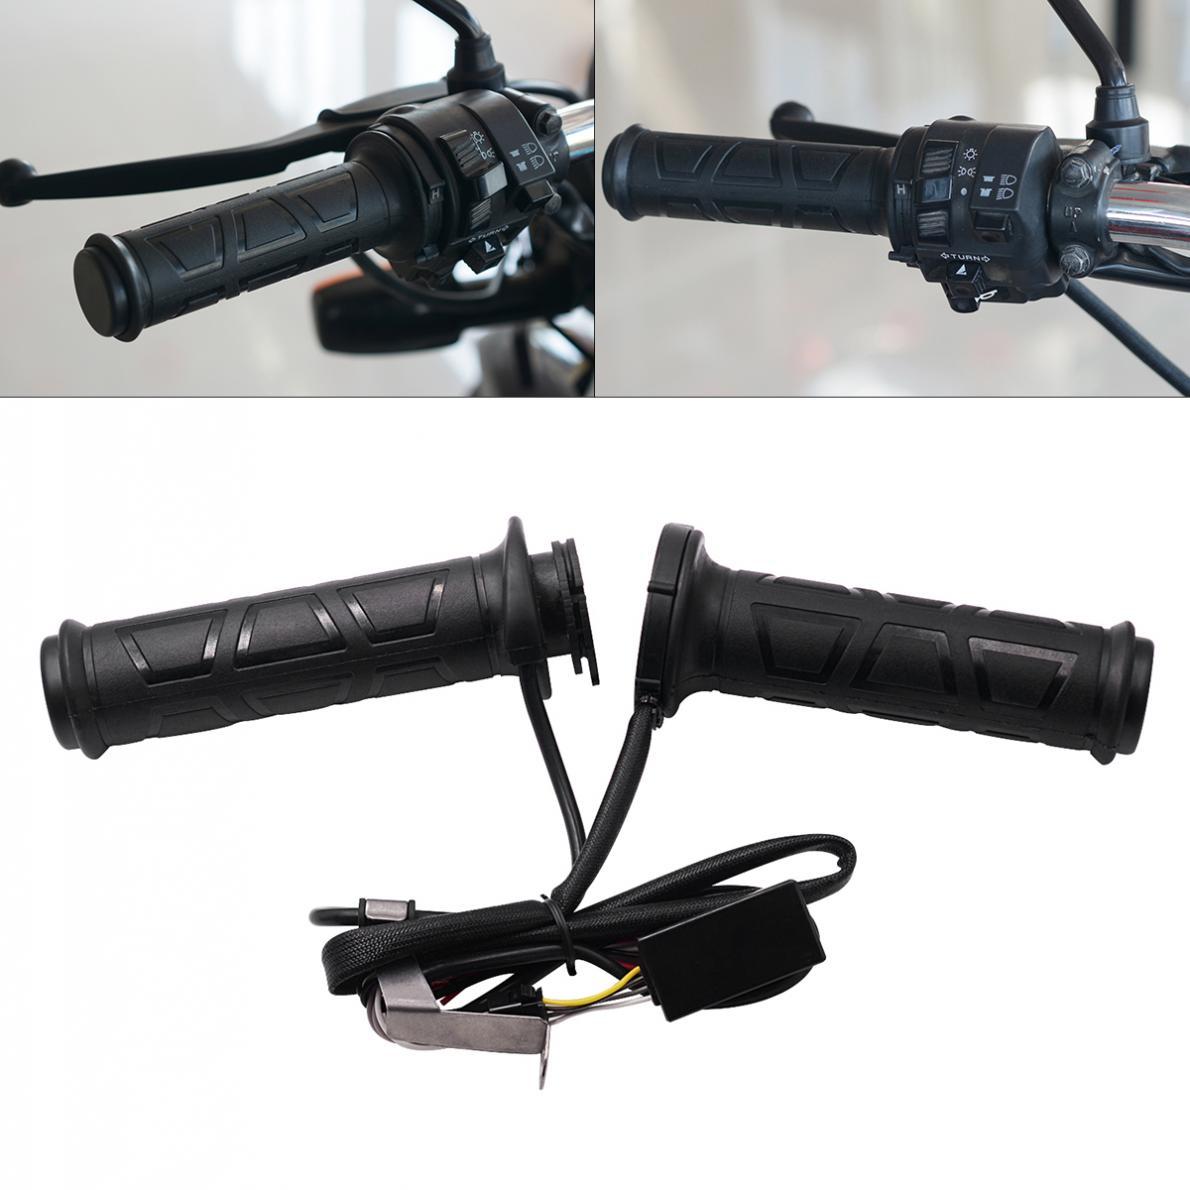 1 Pair 12V 12W-24W 22MM Adjustable Temperature Motorcycle Handlebar Universal Electric Heated Handle Motorbike Heating Grips Set